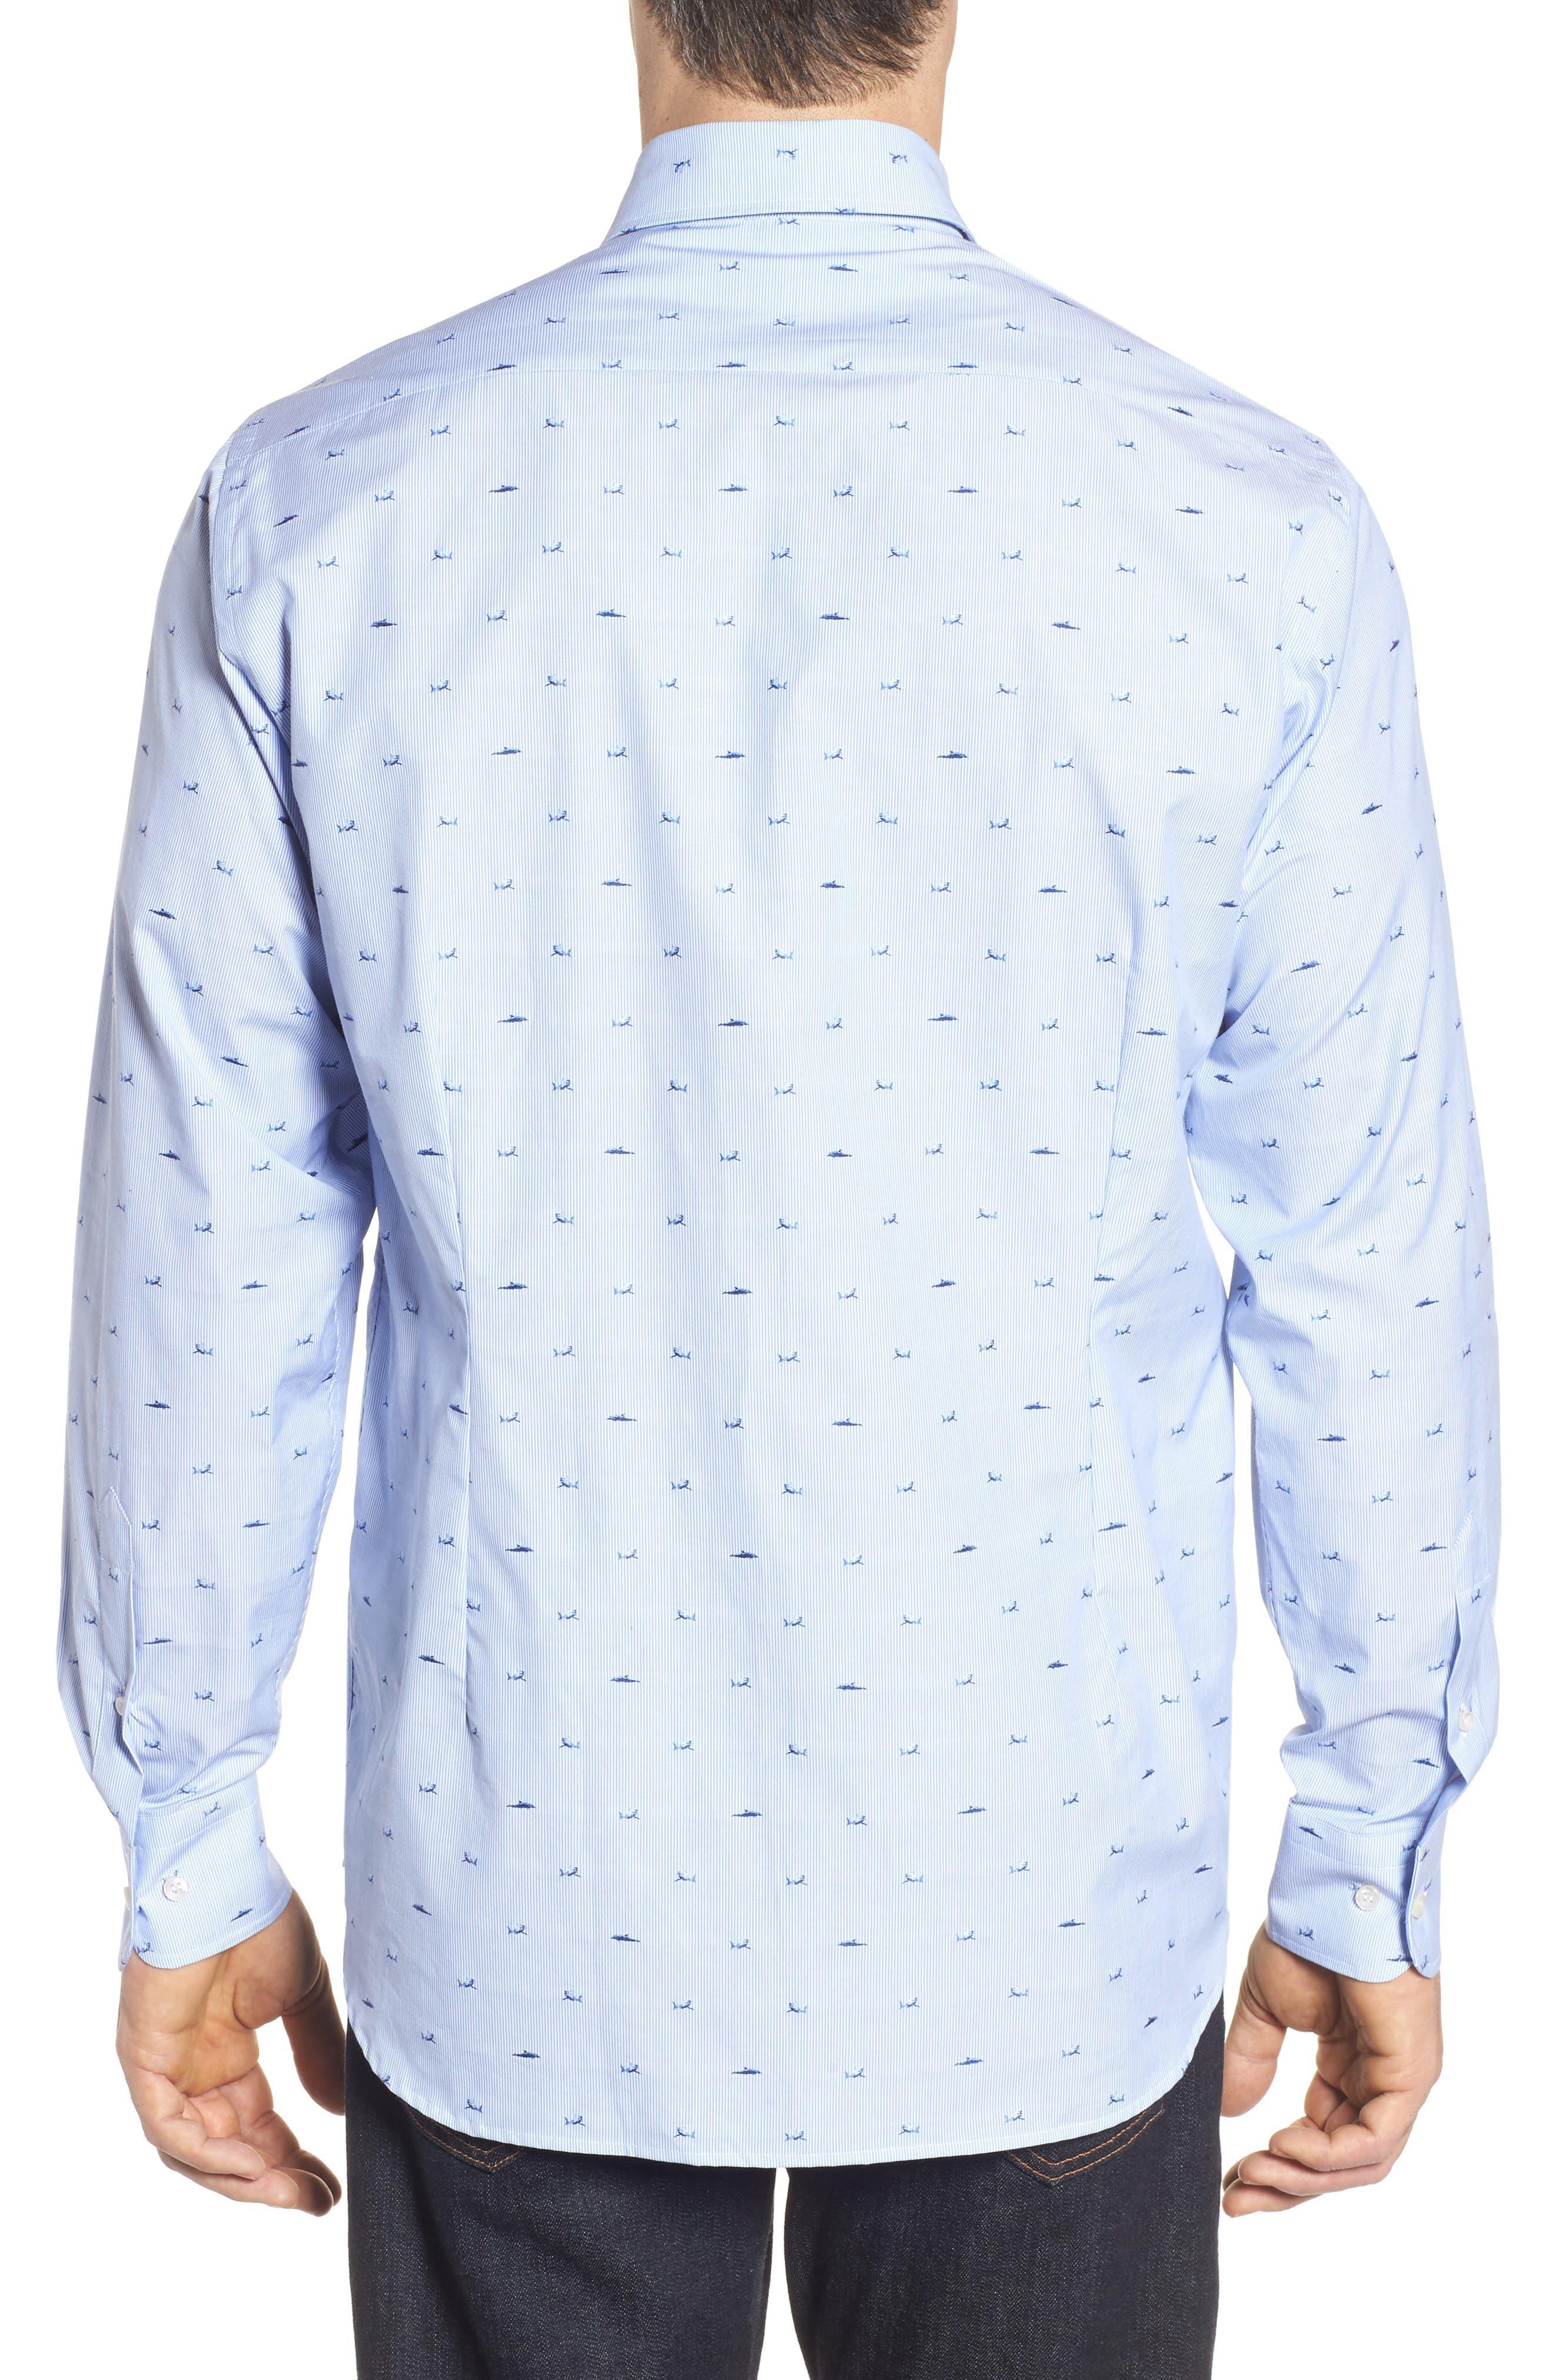 Paul&Shark Great White Jacquard Sport Shirt,                             Alternate thumbnail 3, color,                             Blue